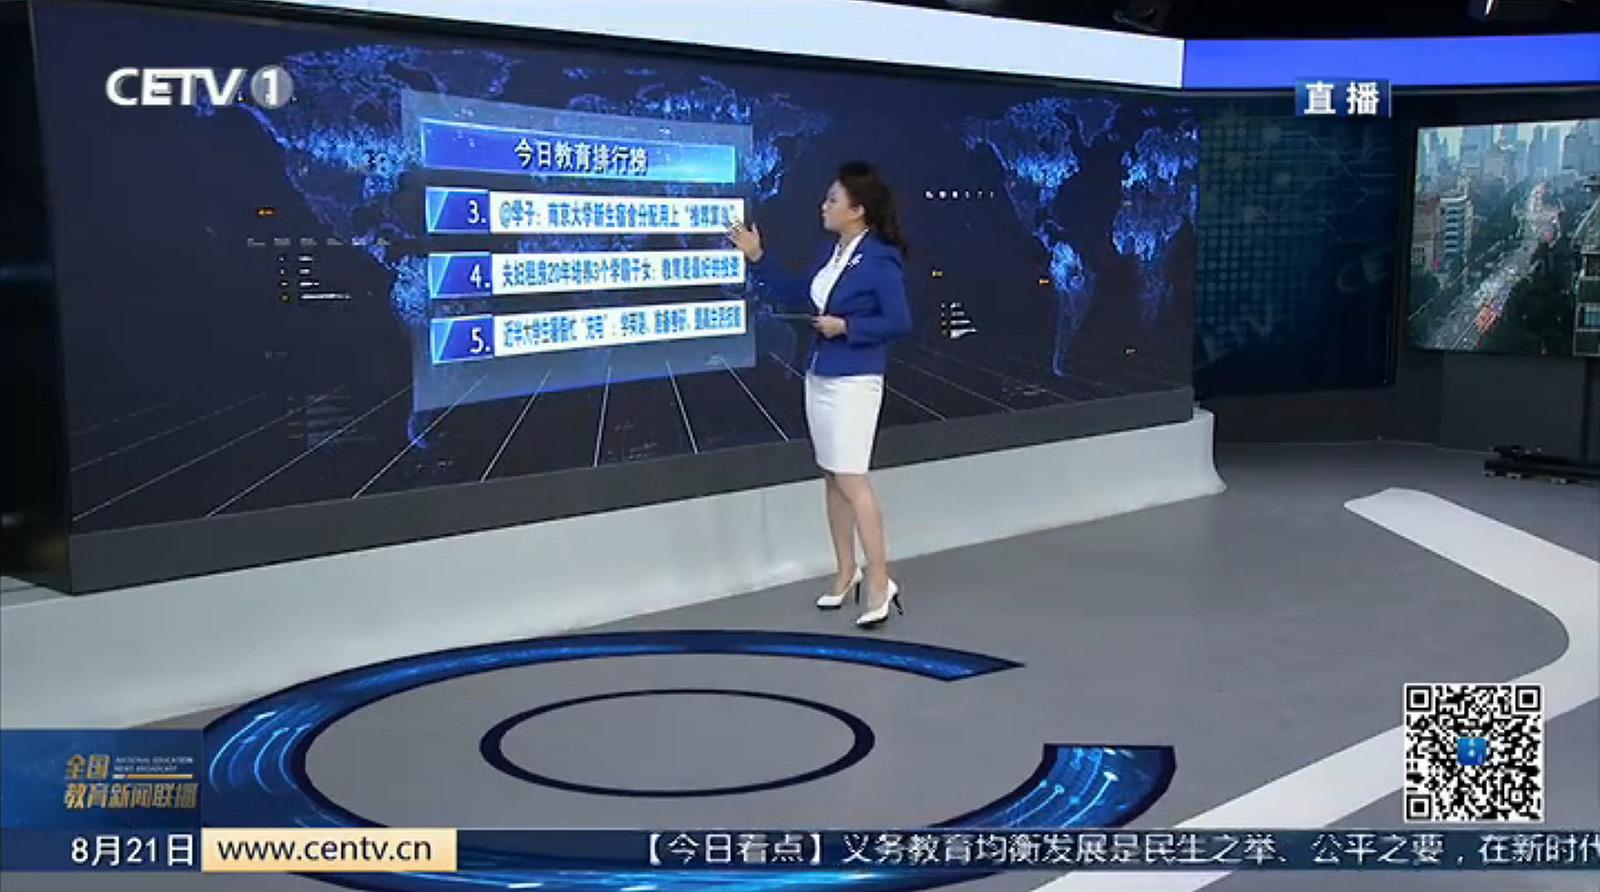 ncs_China-Education-Network-Television-Studio_0006